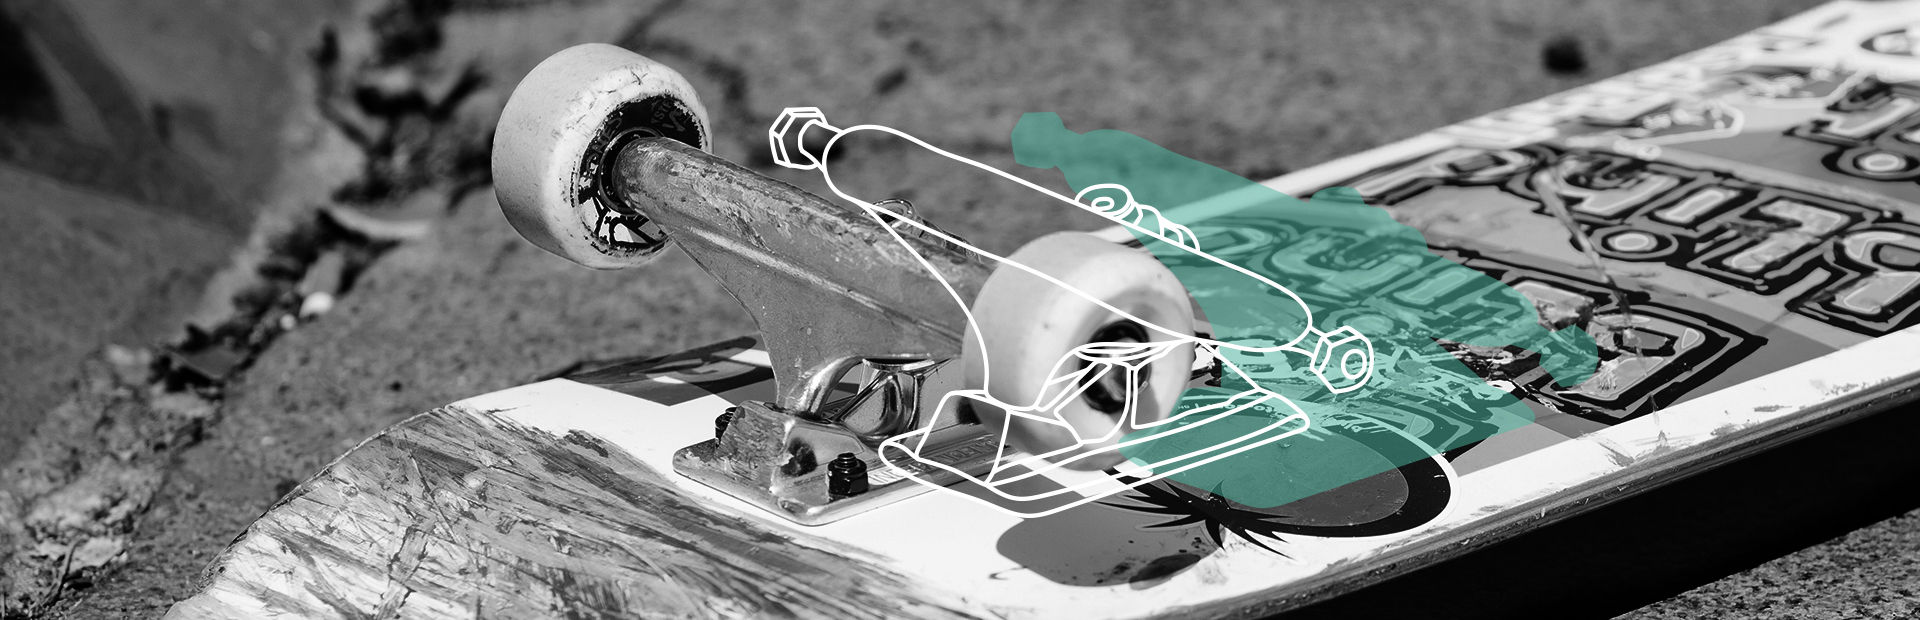 Skateboard trucks closeup